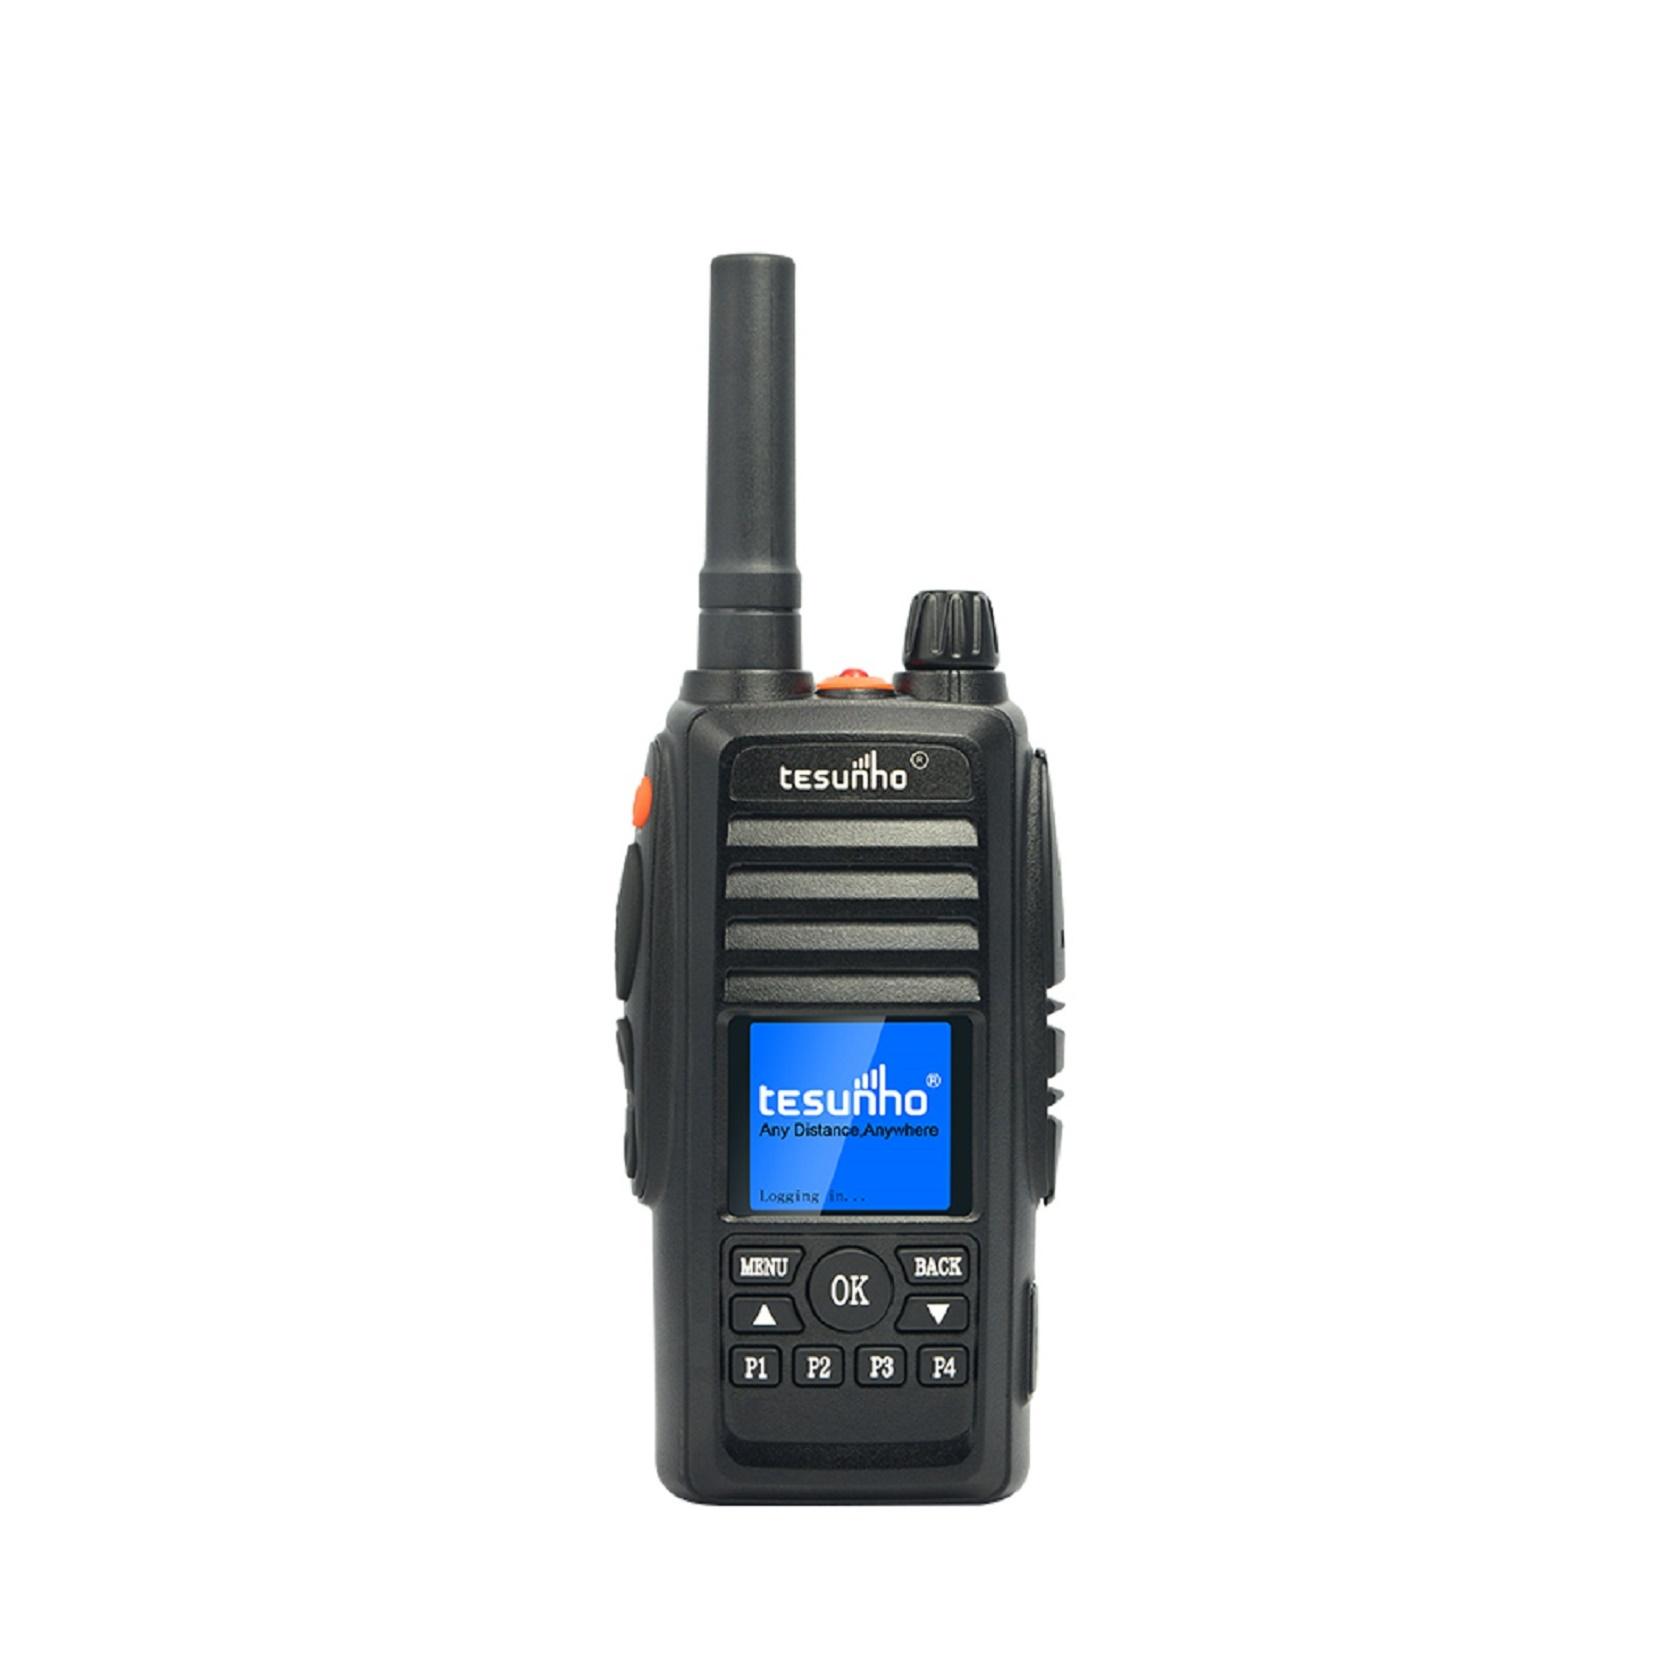 LTE 4G Walkie Talkie With APRS GPS Tracking Tesunho TH388